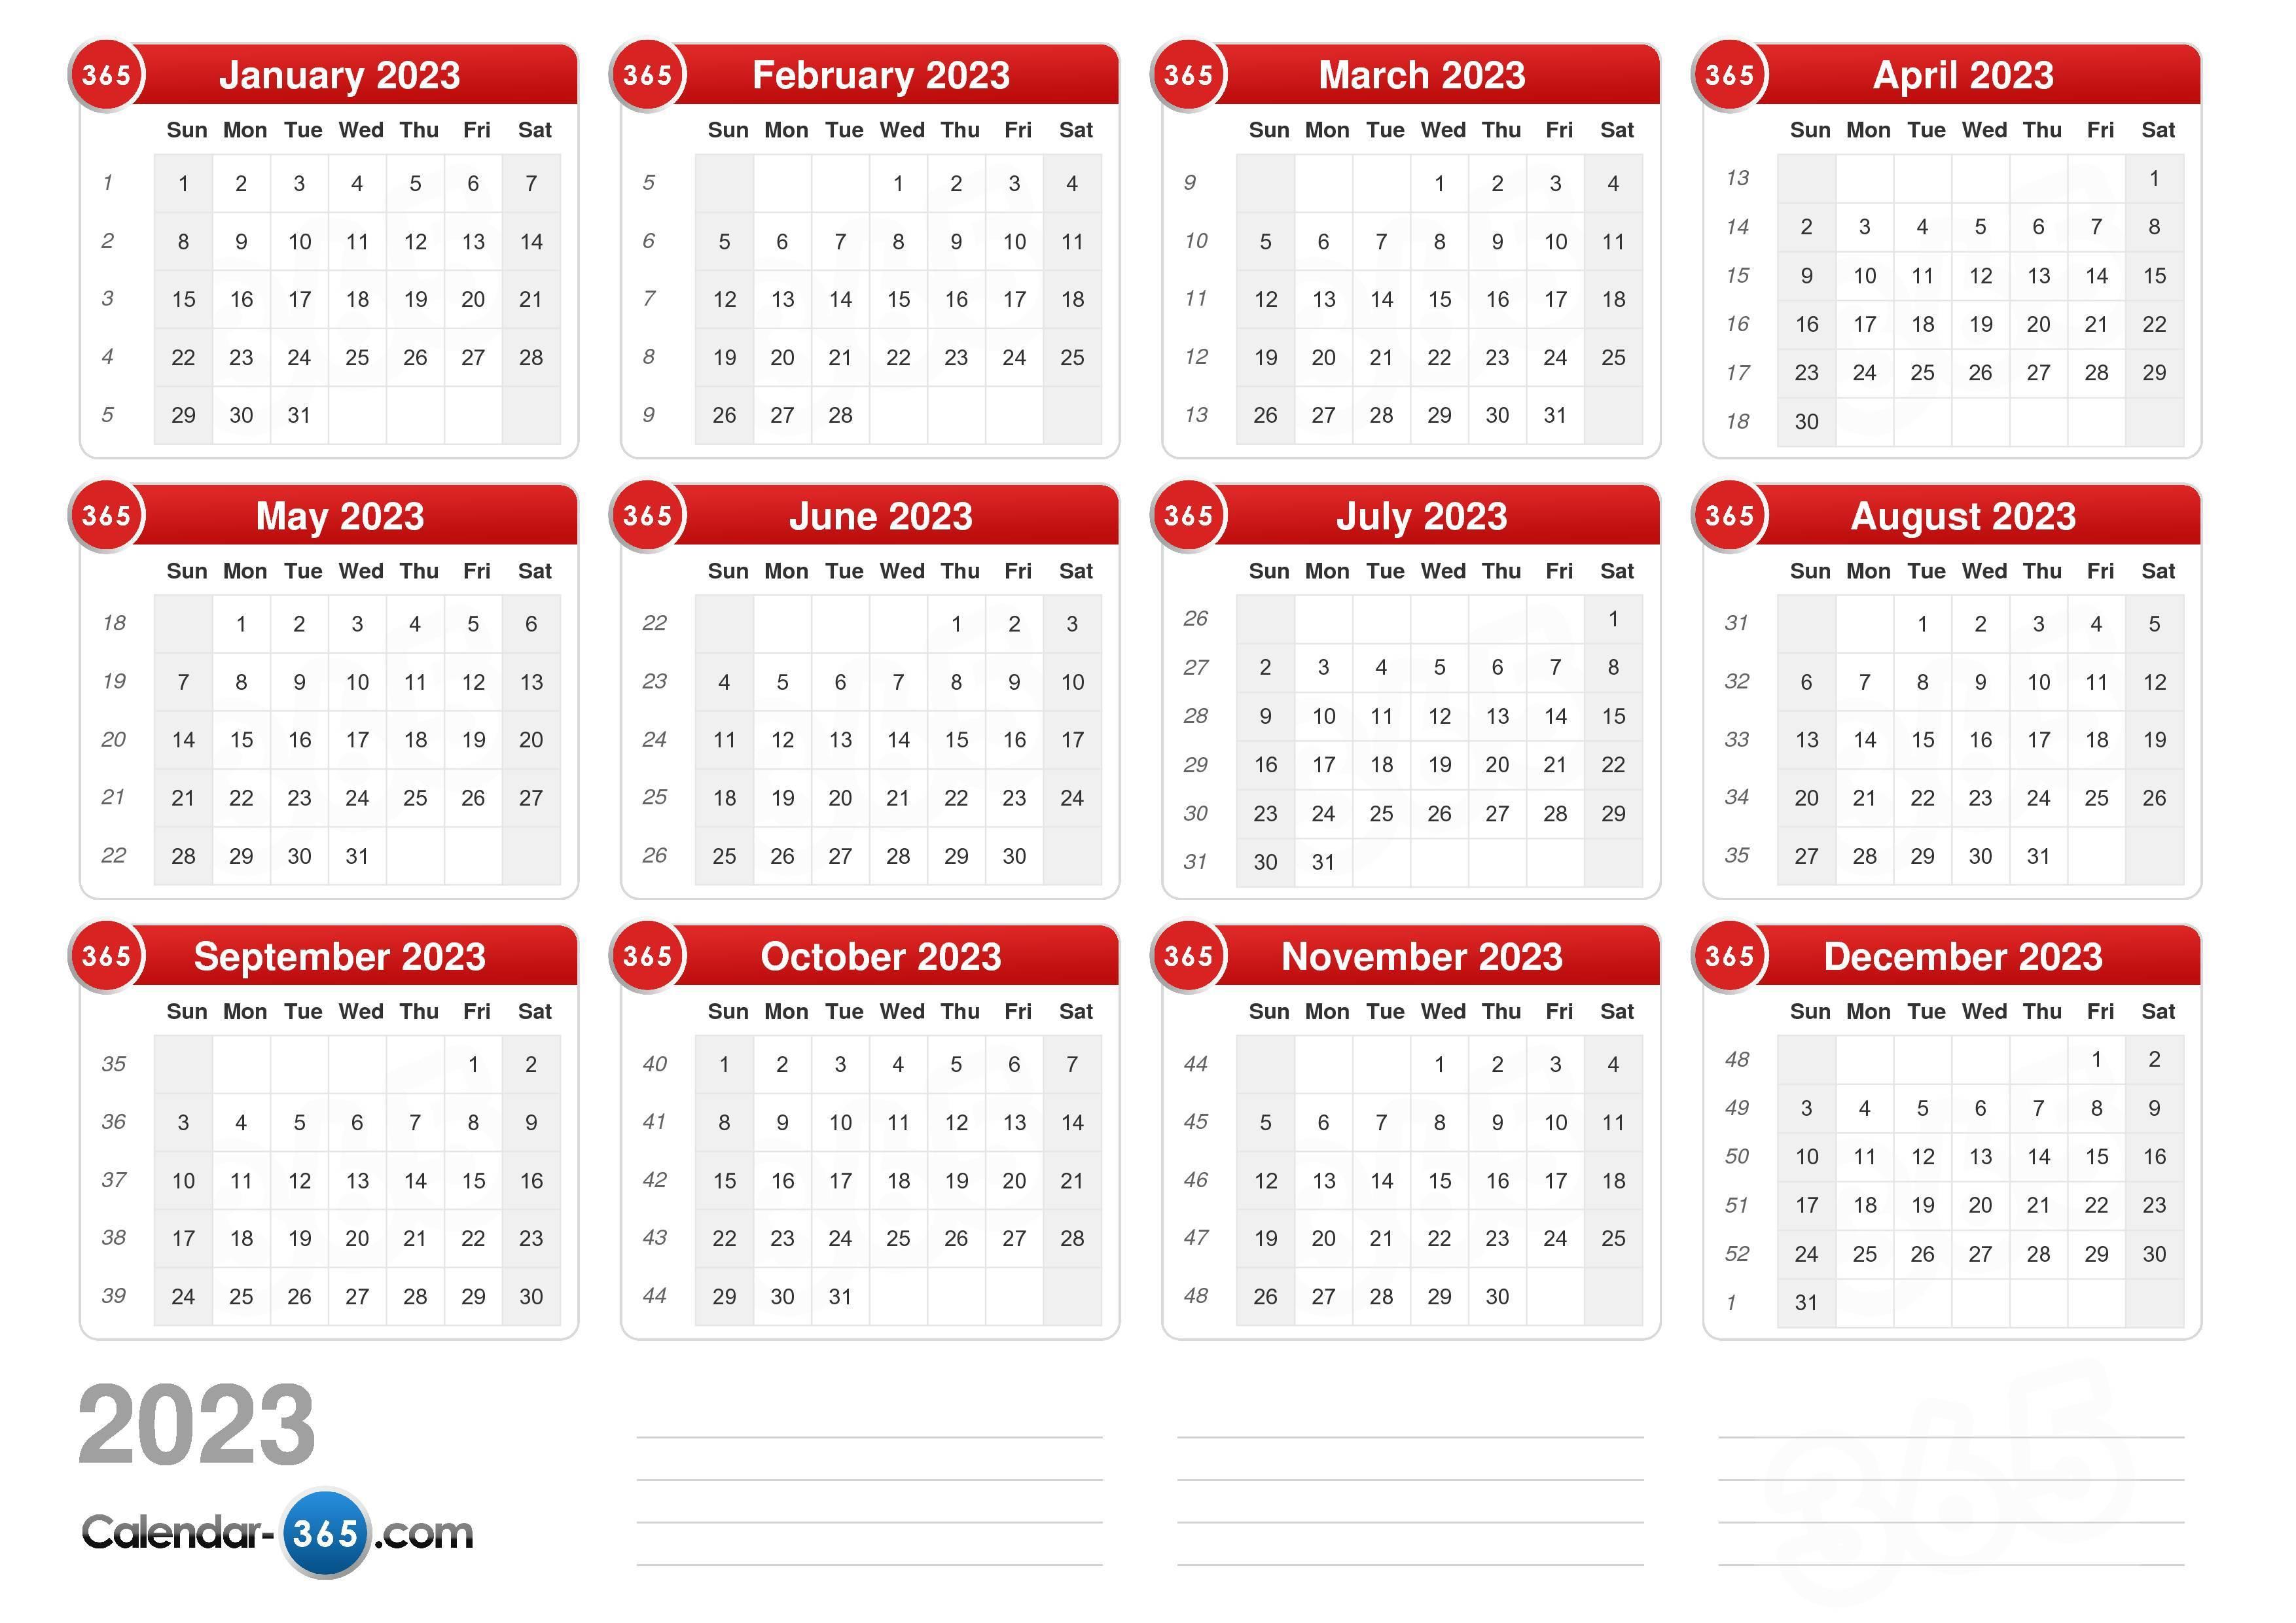 2023 calendar v2 new